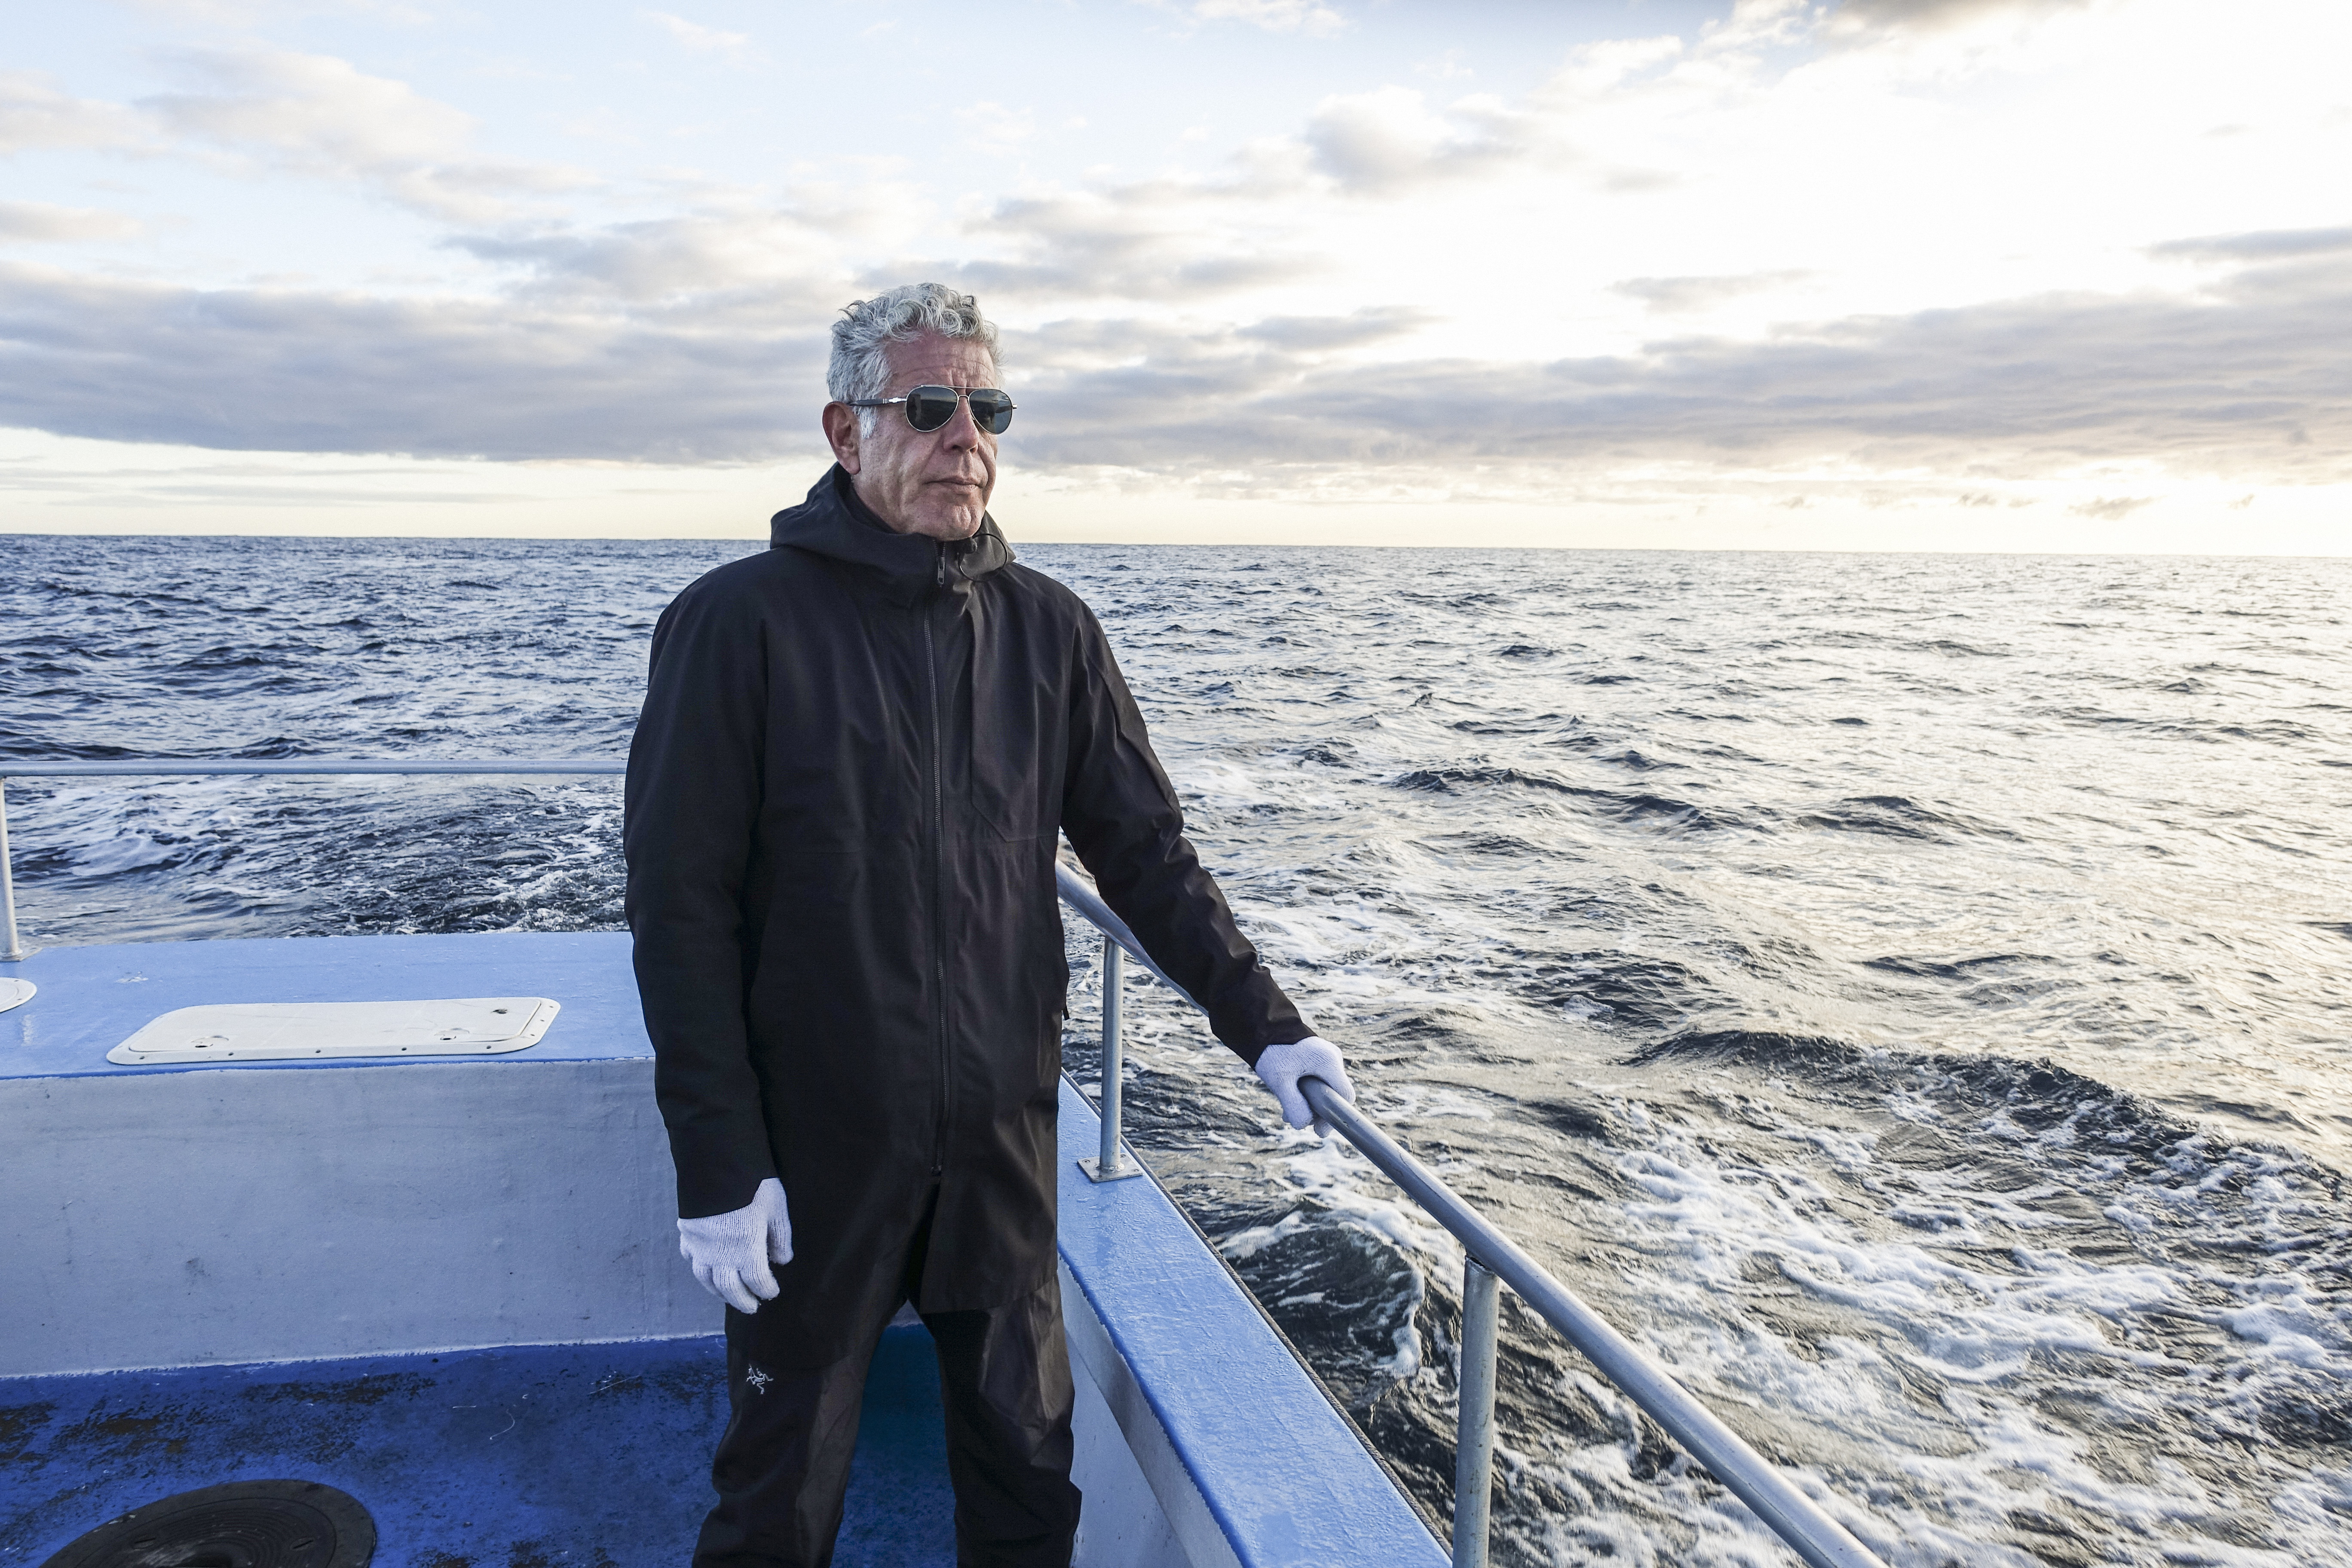 Anthony Bourdain on a boat off the coast of Newfoundland